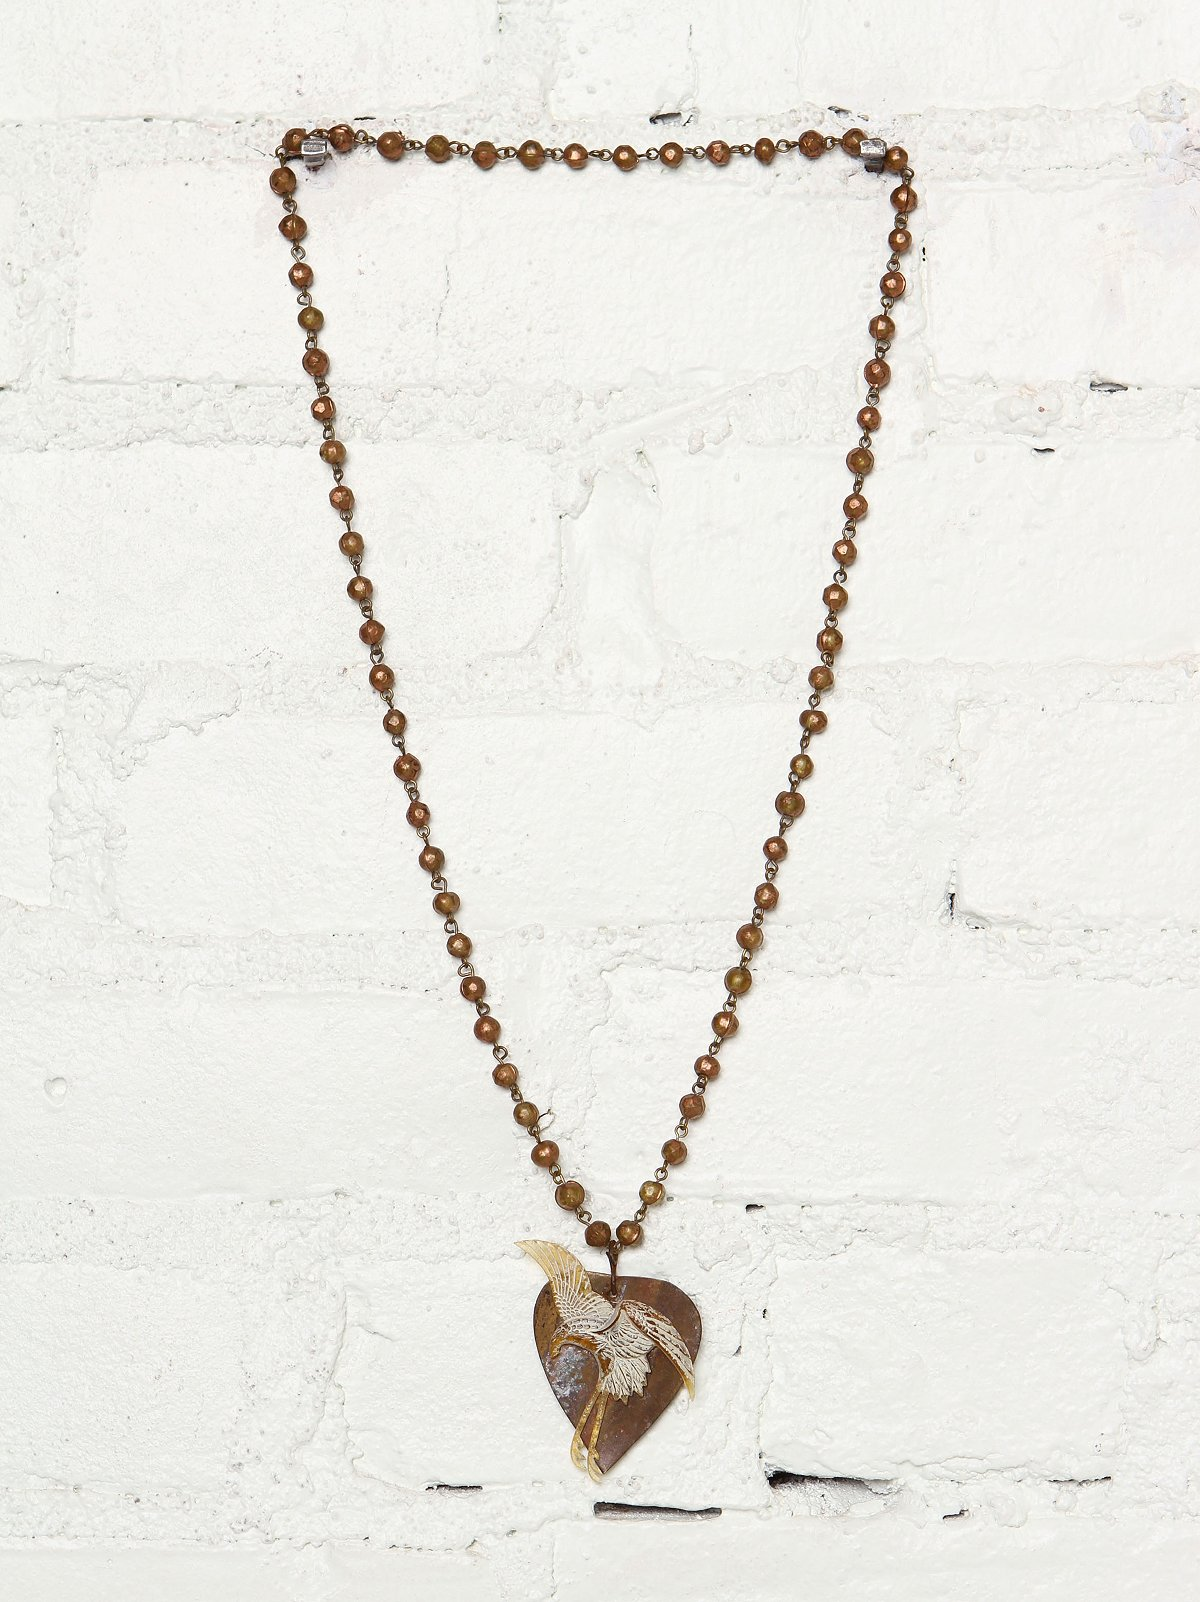 Vintage Handmade Necklace